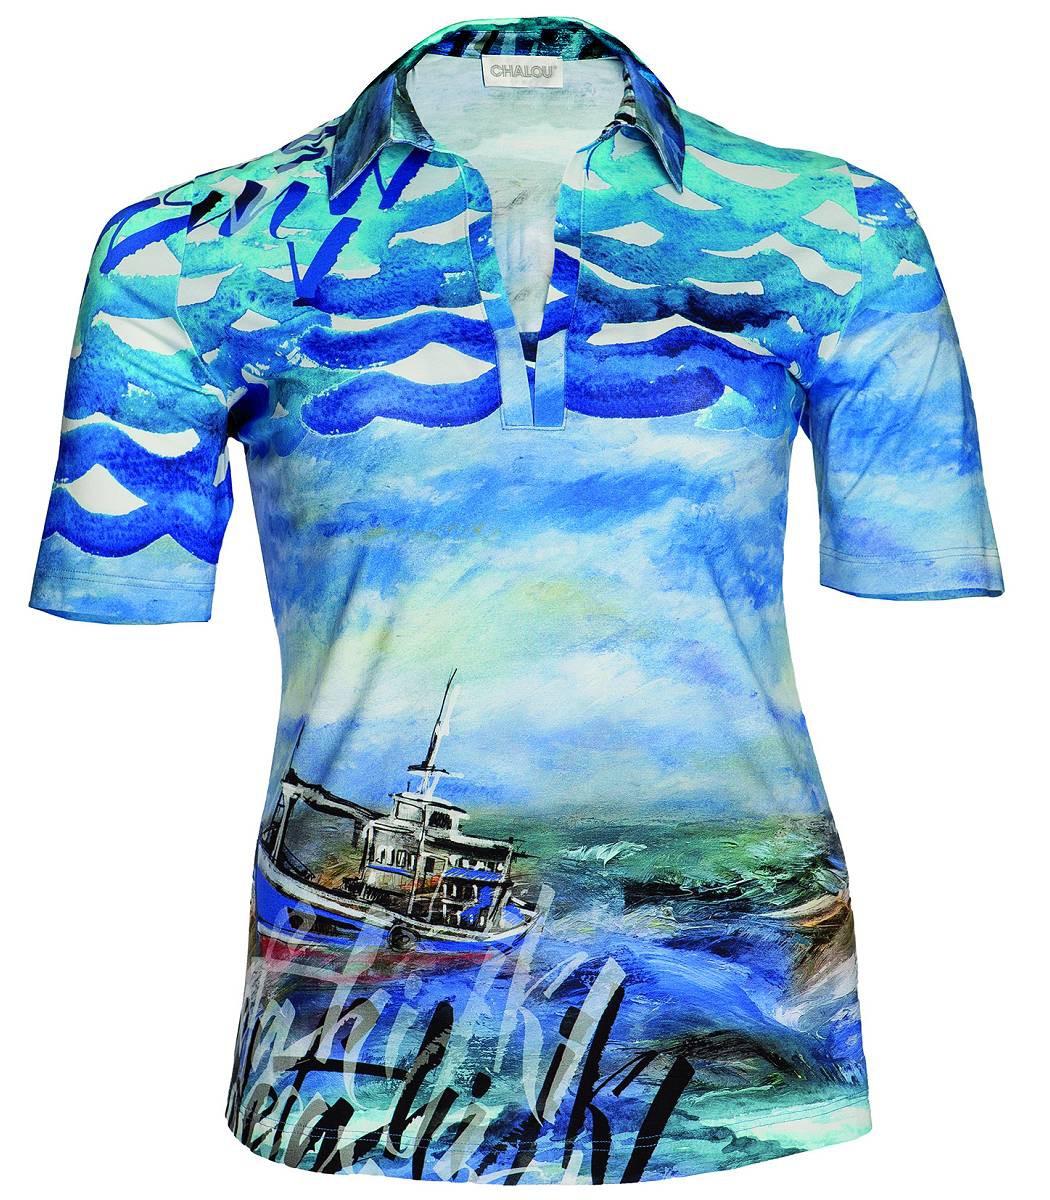 hawaii poloshirt f r damen von chalou gro e gr en in blau. Black Bedroom Furniture Sets. Home Design Ideas